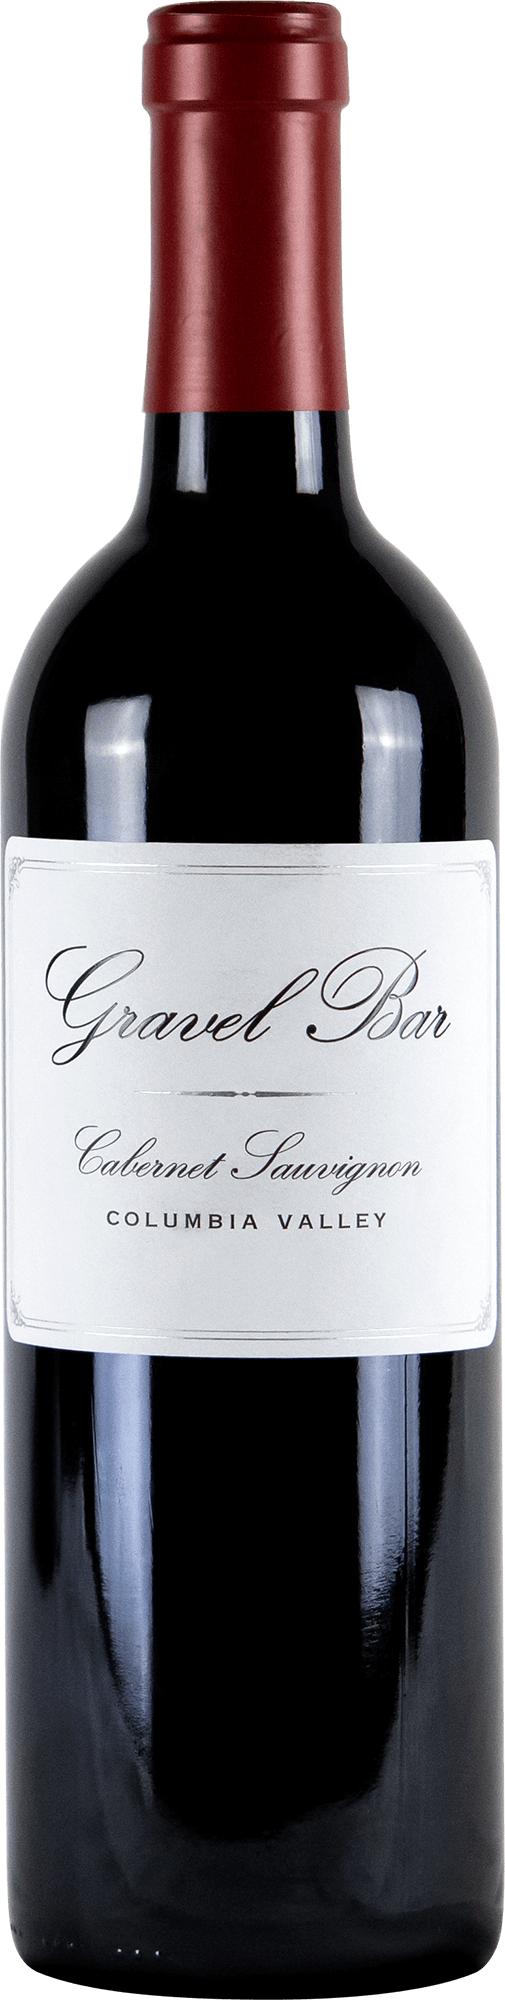 Gravel Bar Cabernet Sauvignon Bottleshot